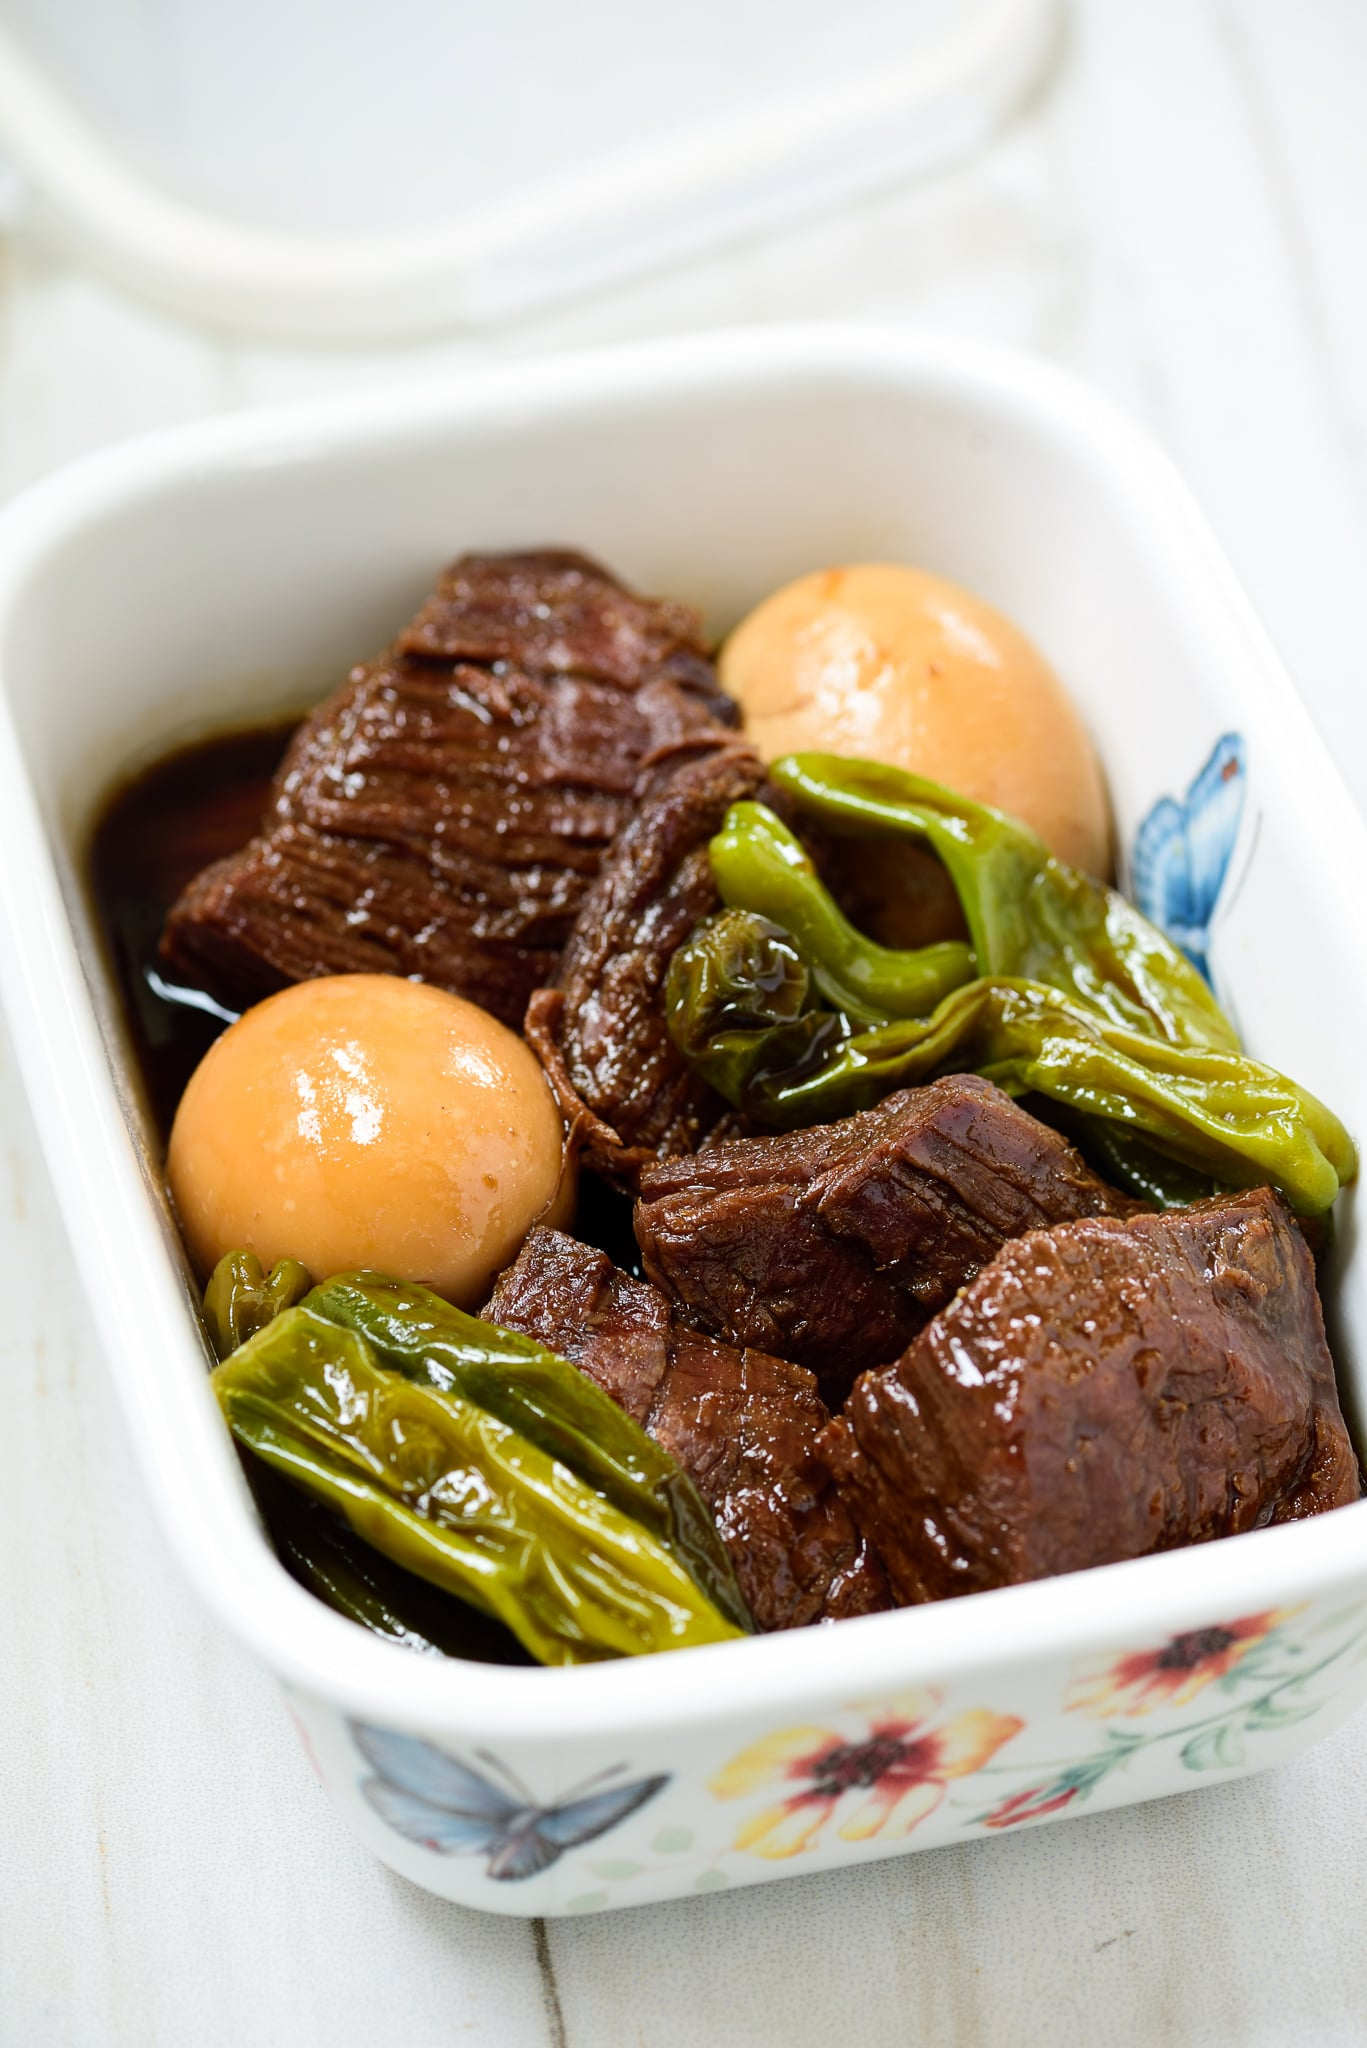 DSC3818 - Jangjorim (Soy Braised Beef)